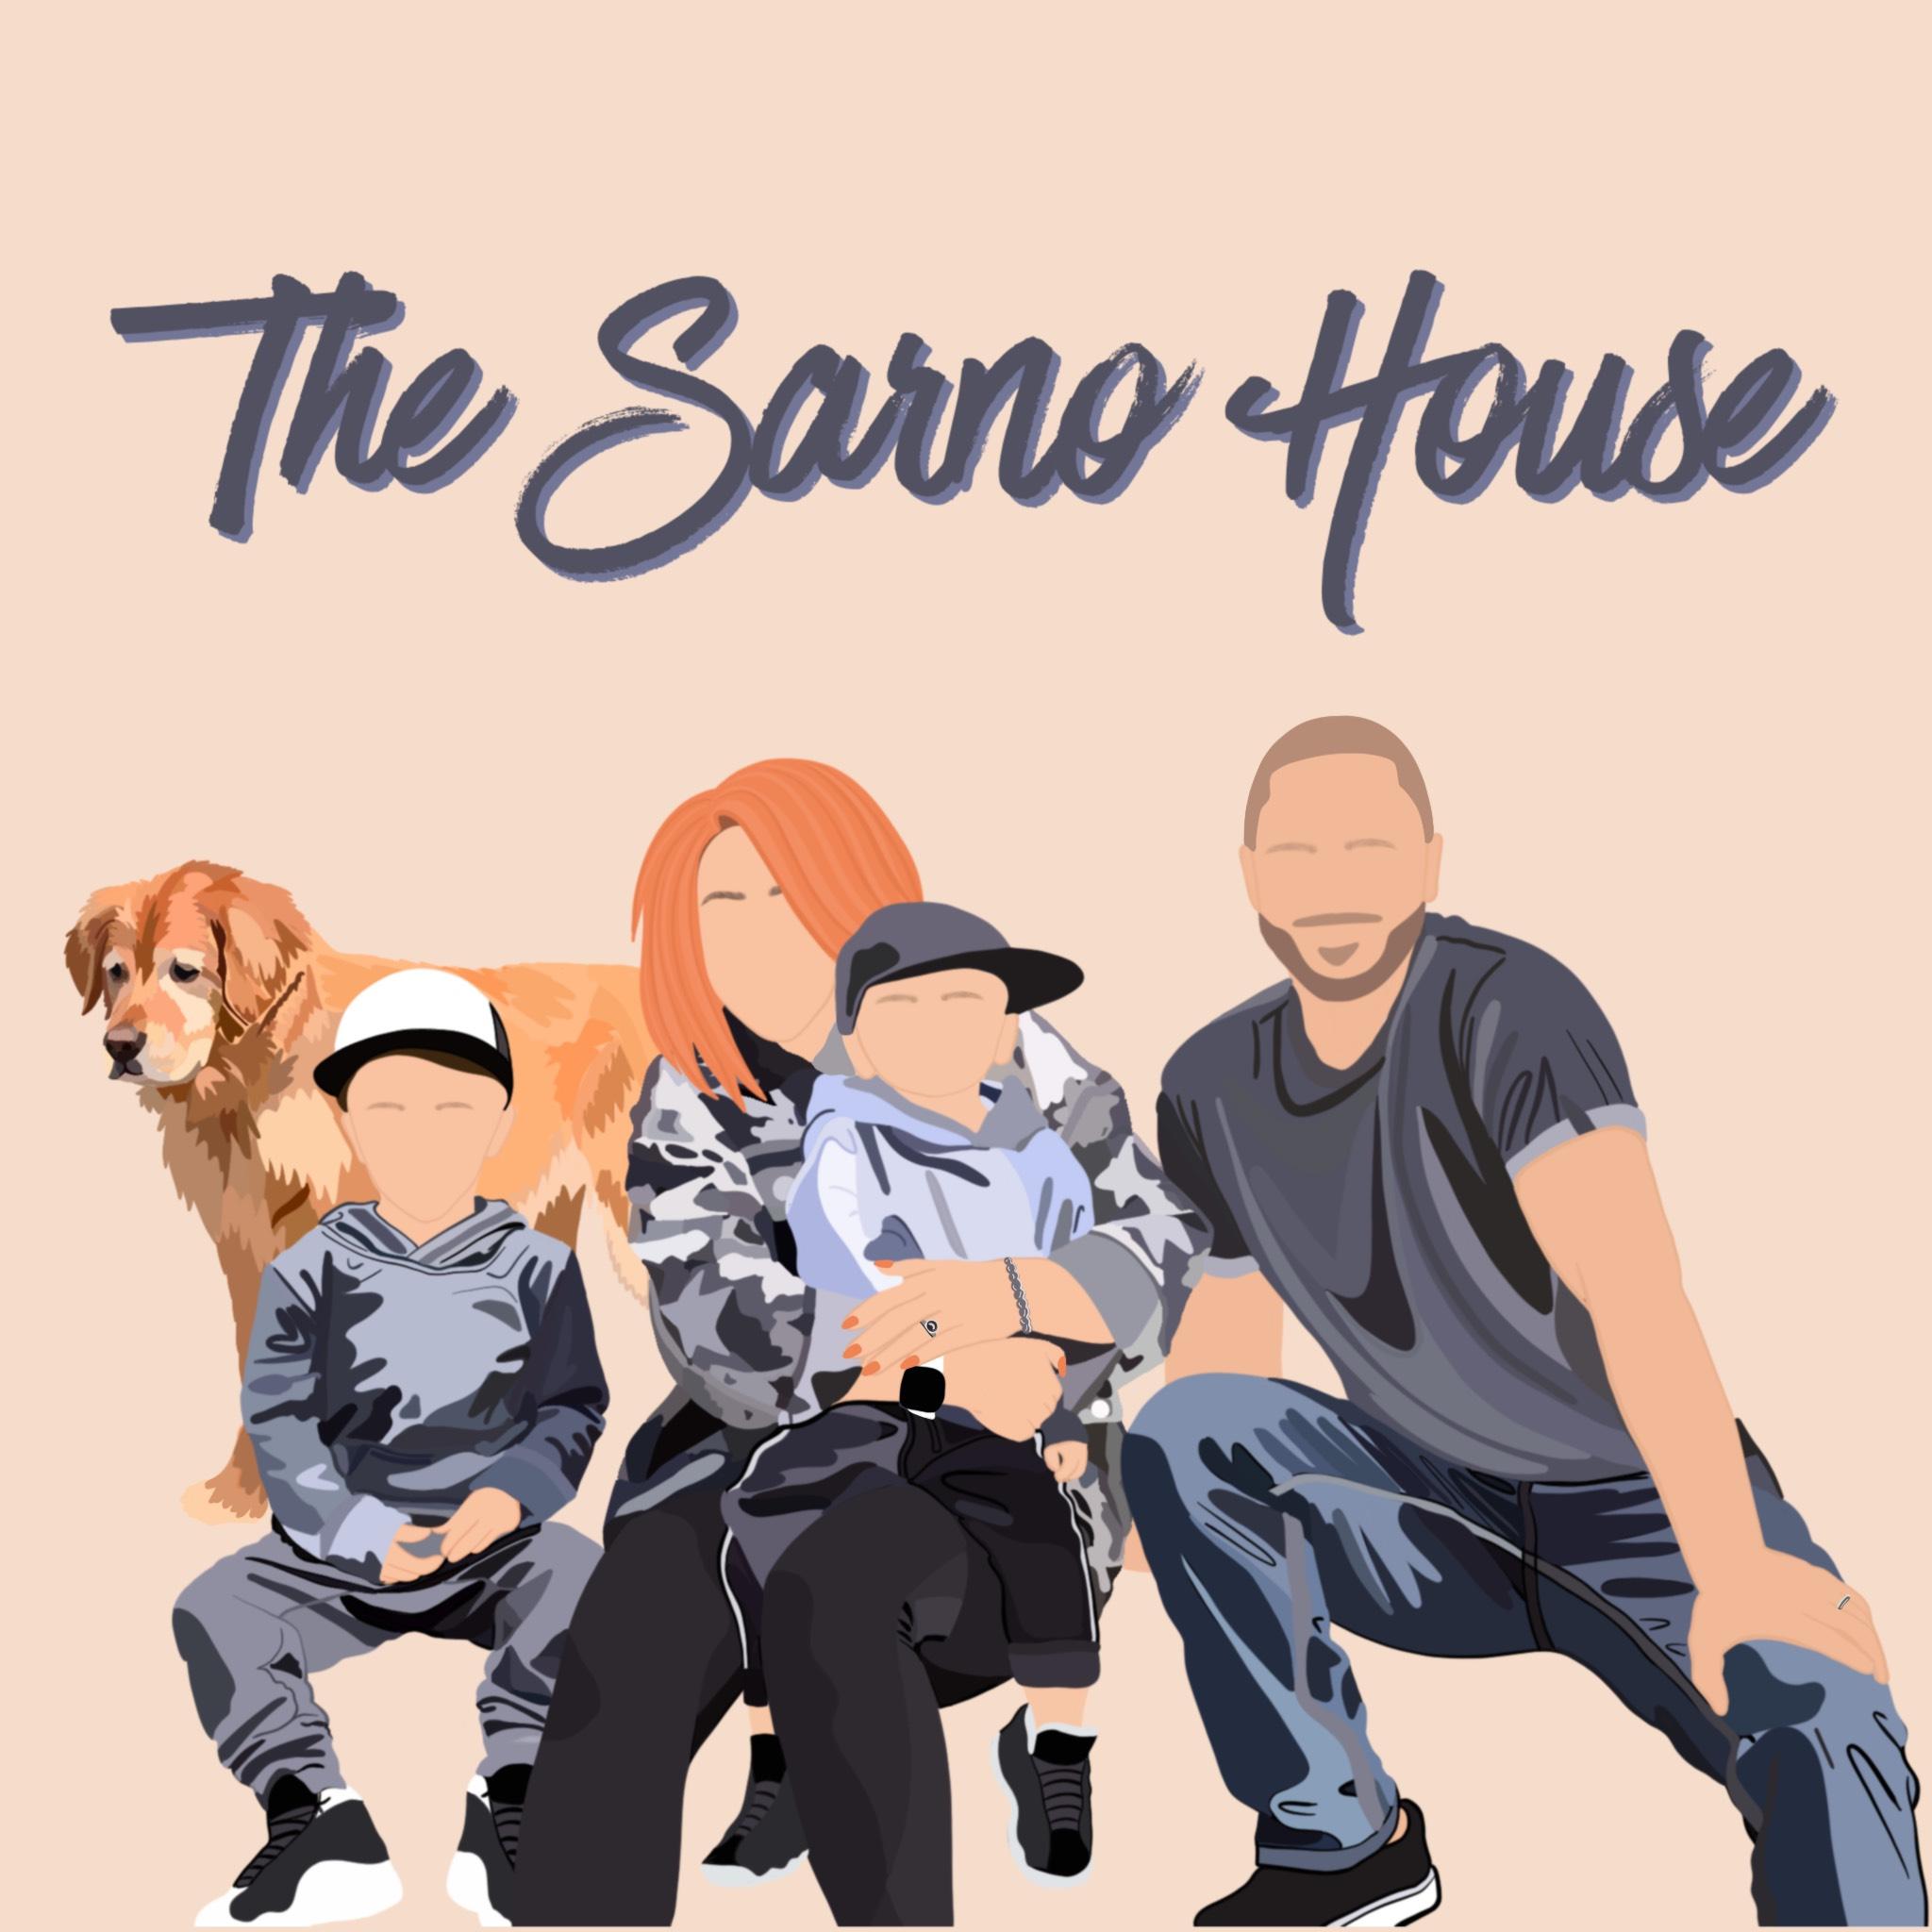 The Sarno House show art